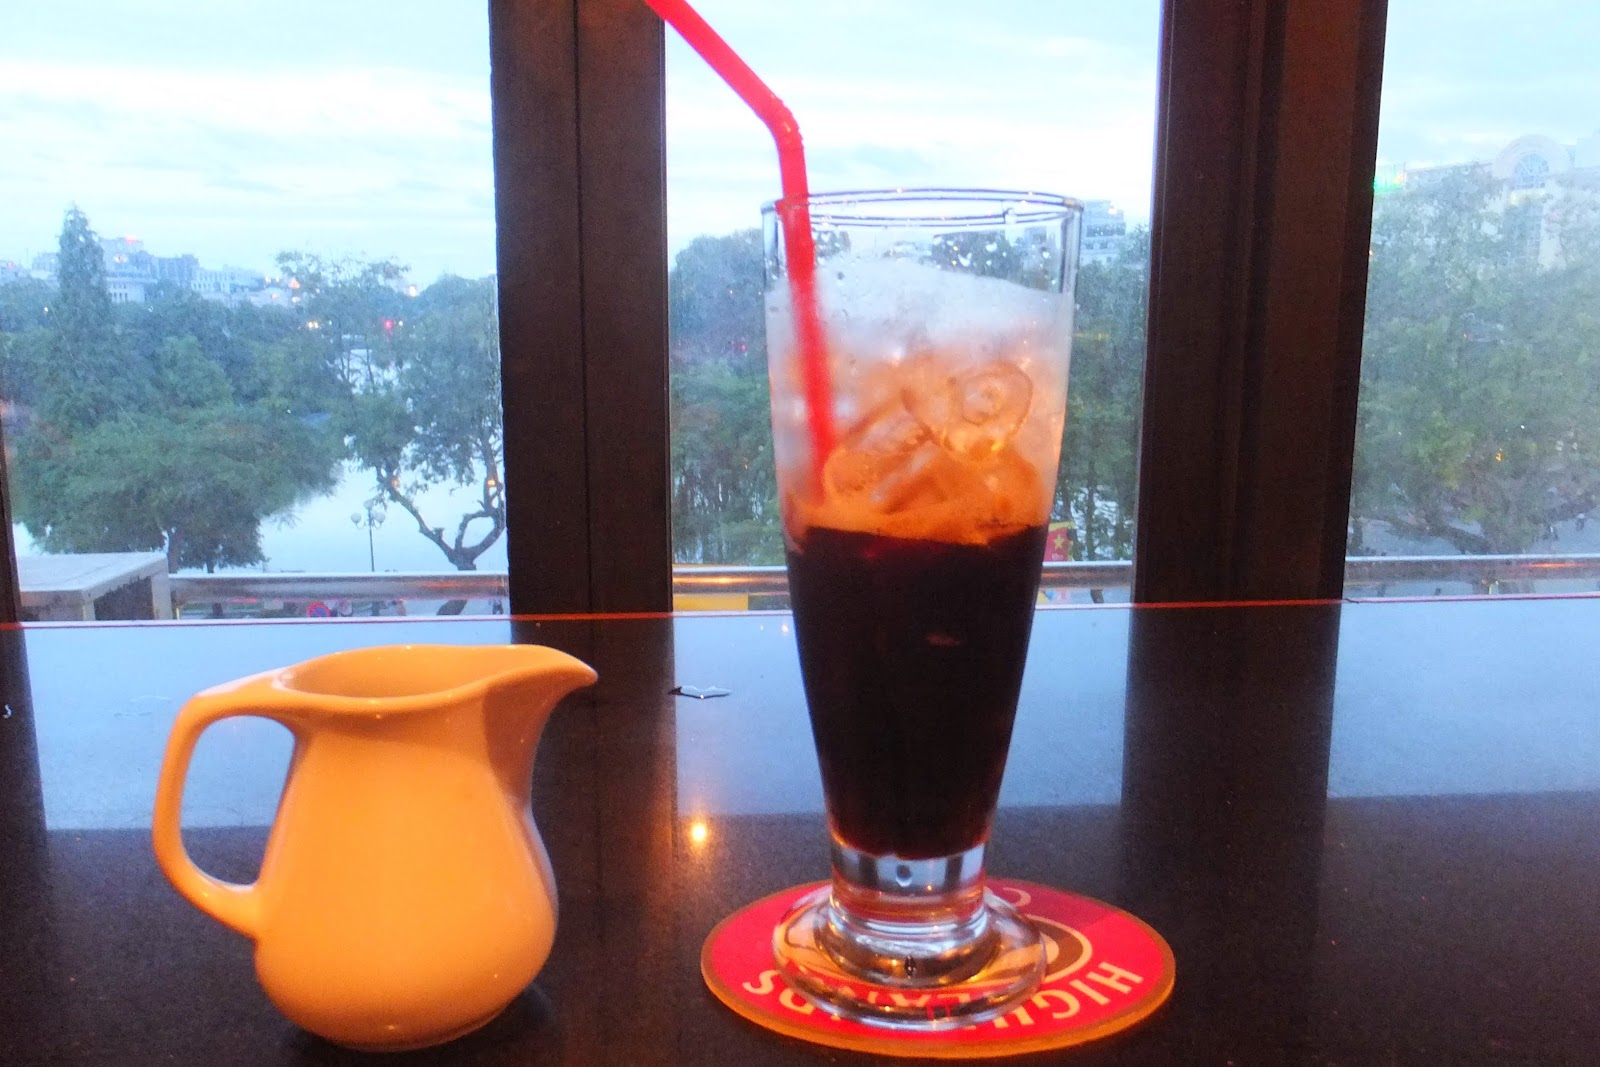 vietnam-icecoffee ベトナムアイスコーヒー